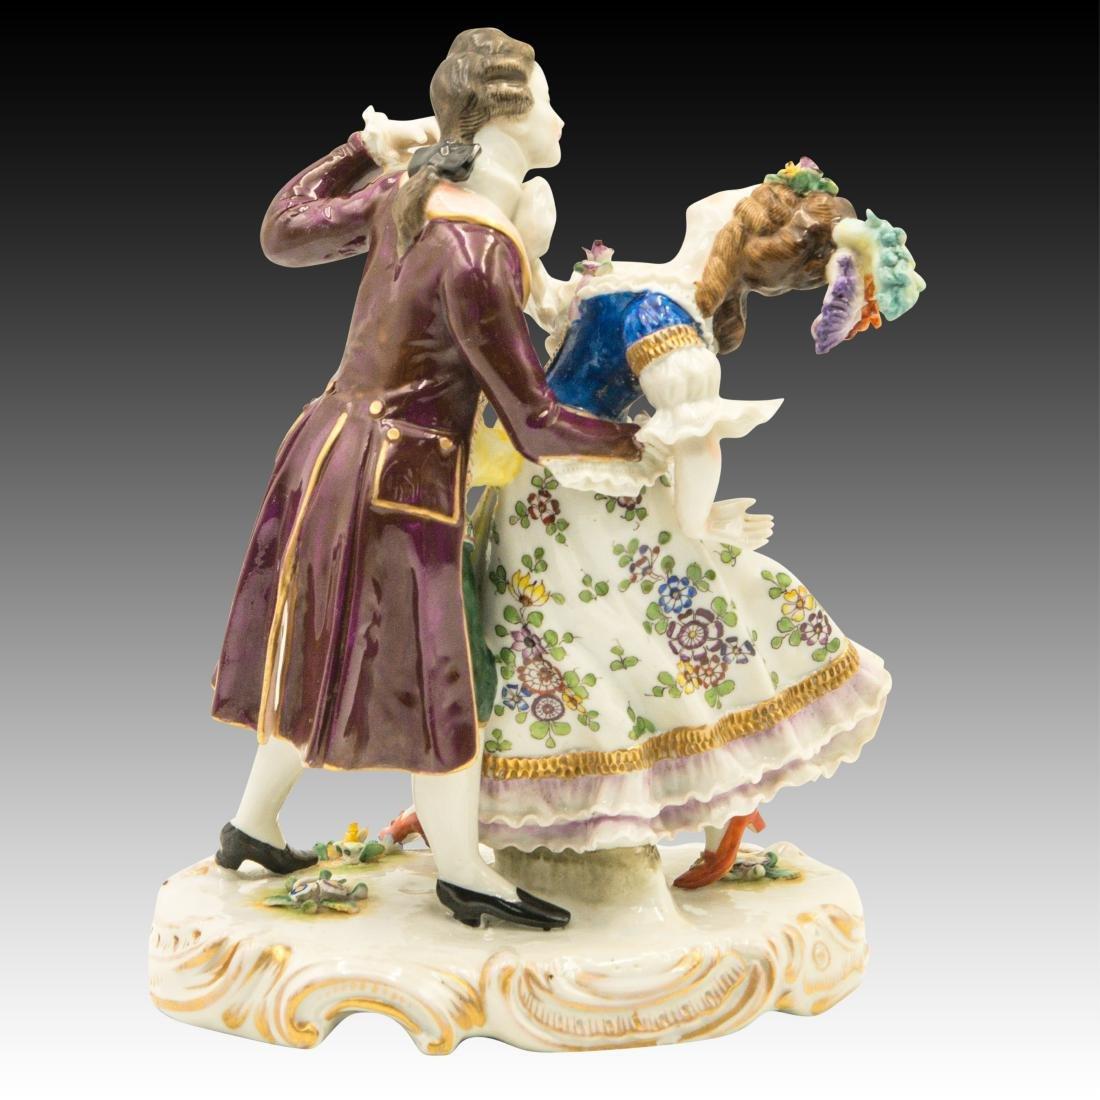 Sitzendorf French Style Dancing Couple Figurine - 3